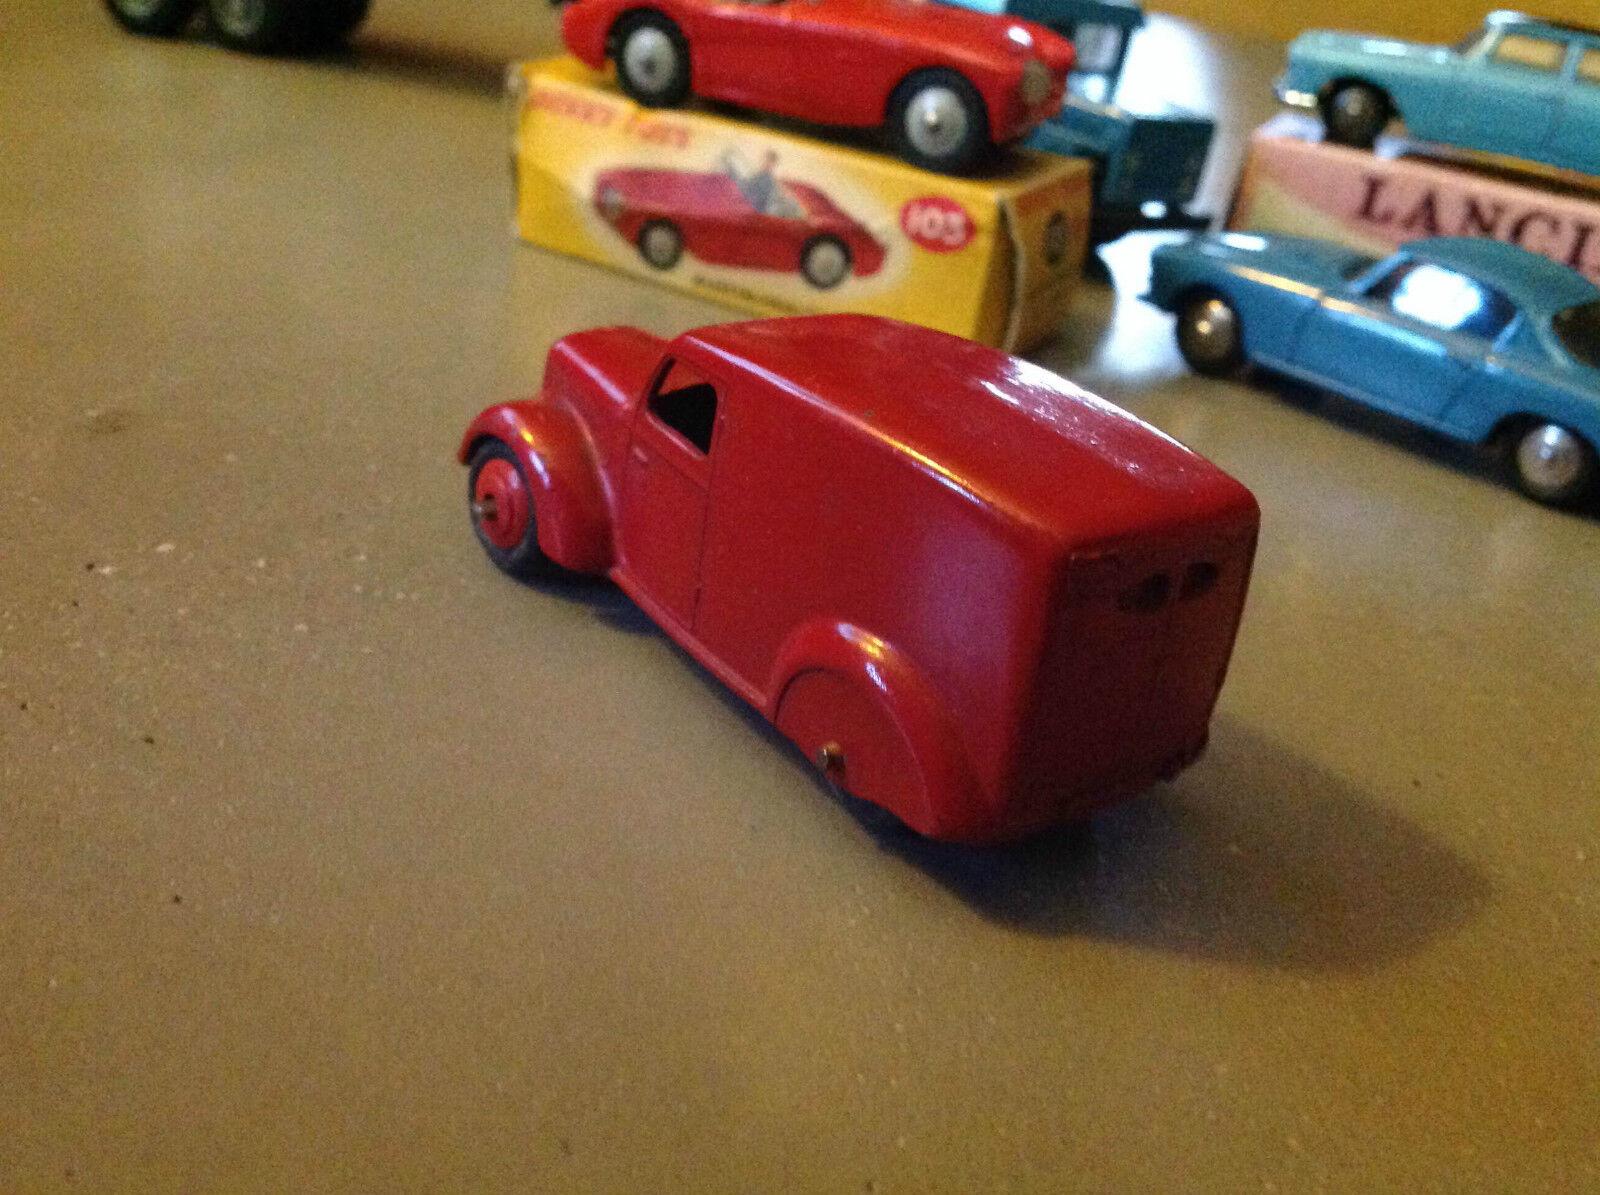 Dinky Toys R FRA 65533;'Drough 65533f.28 fourgonnette de livraison (ann fram65533;65533;e de sorglidas 1940 3 65533;rough 65533me version